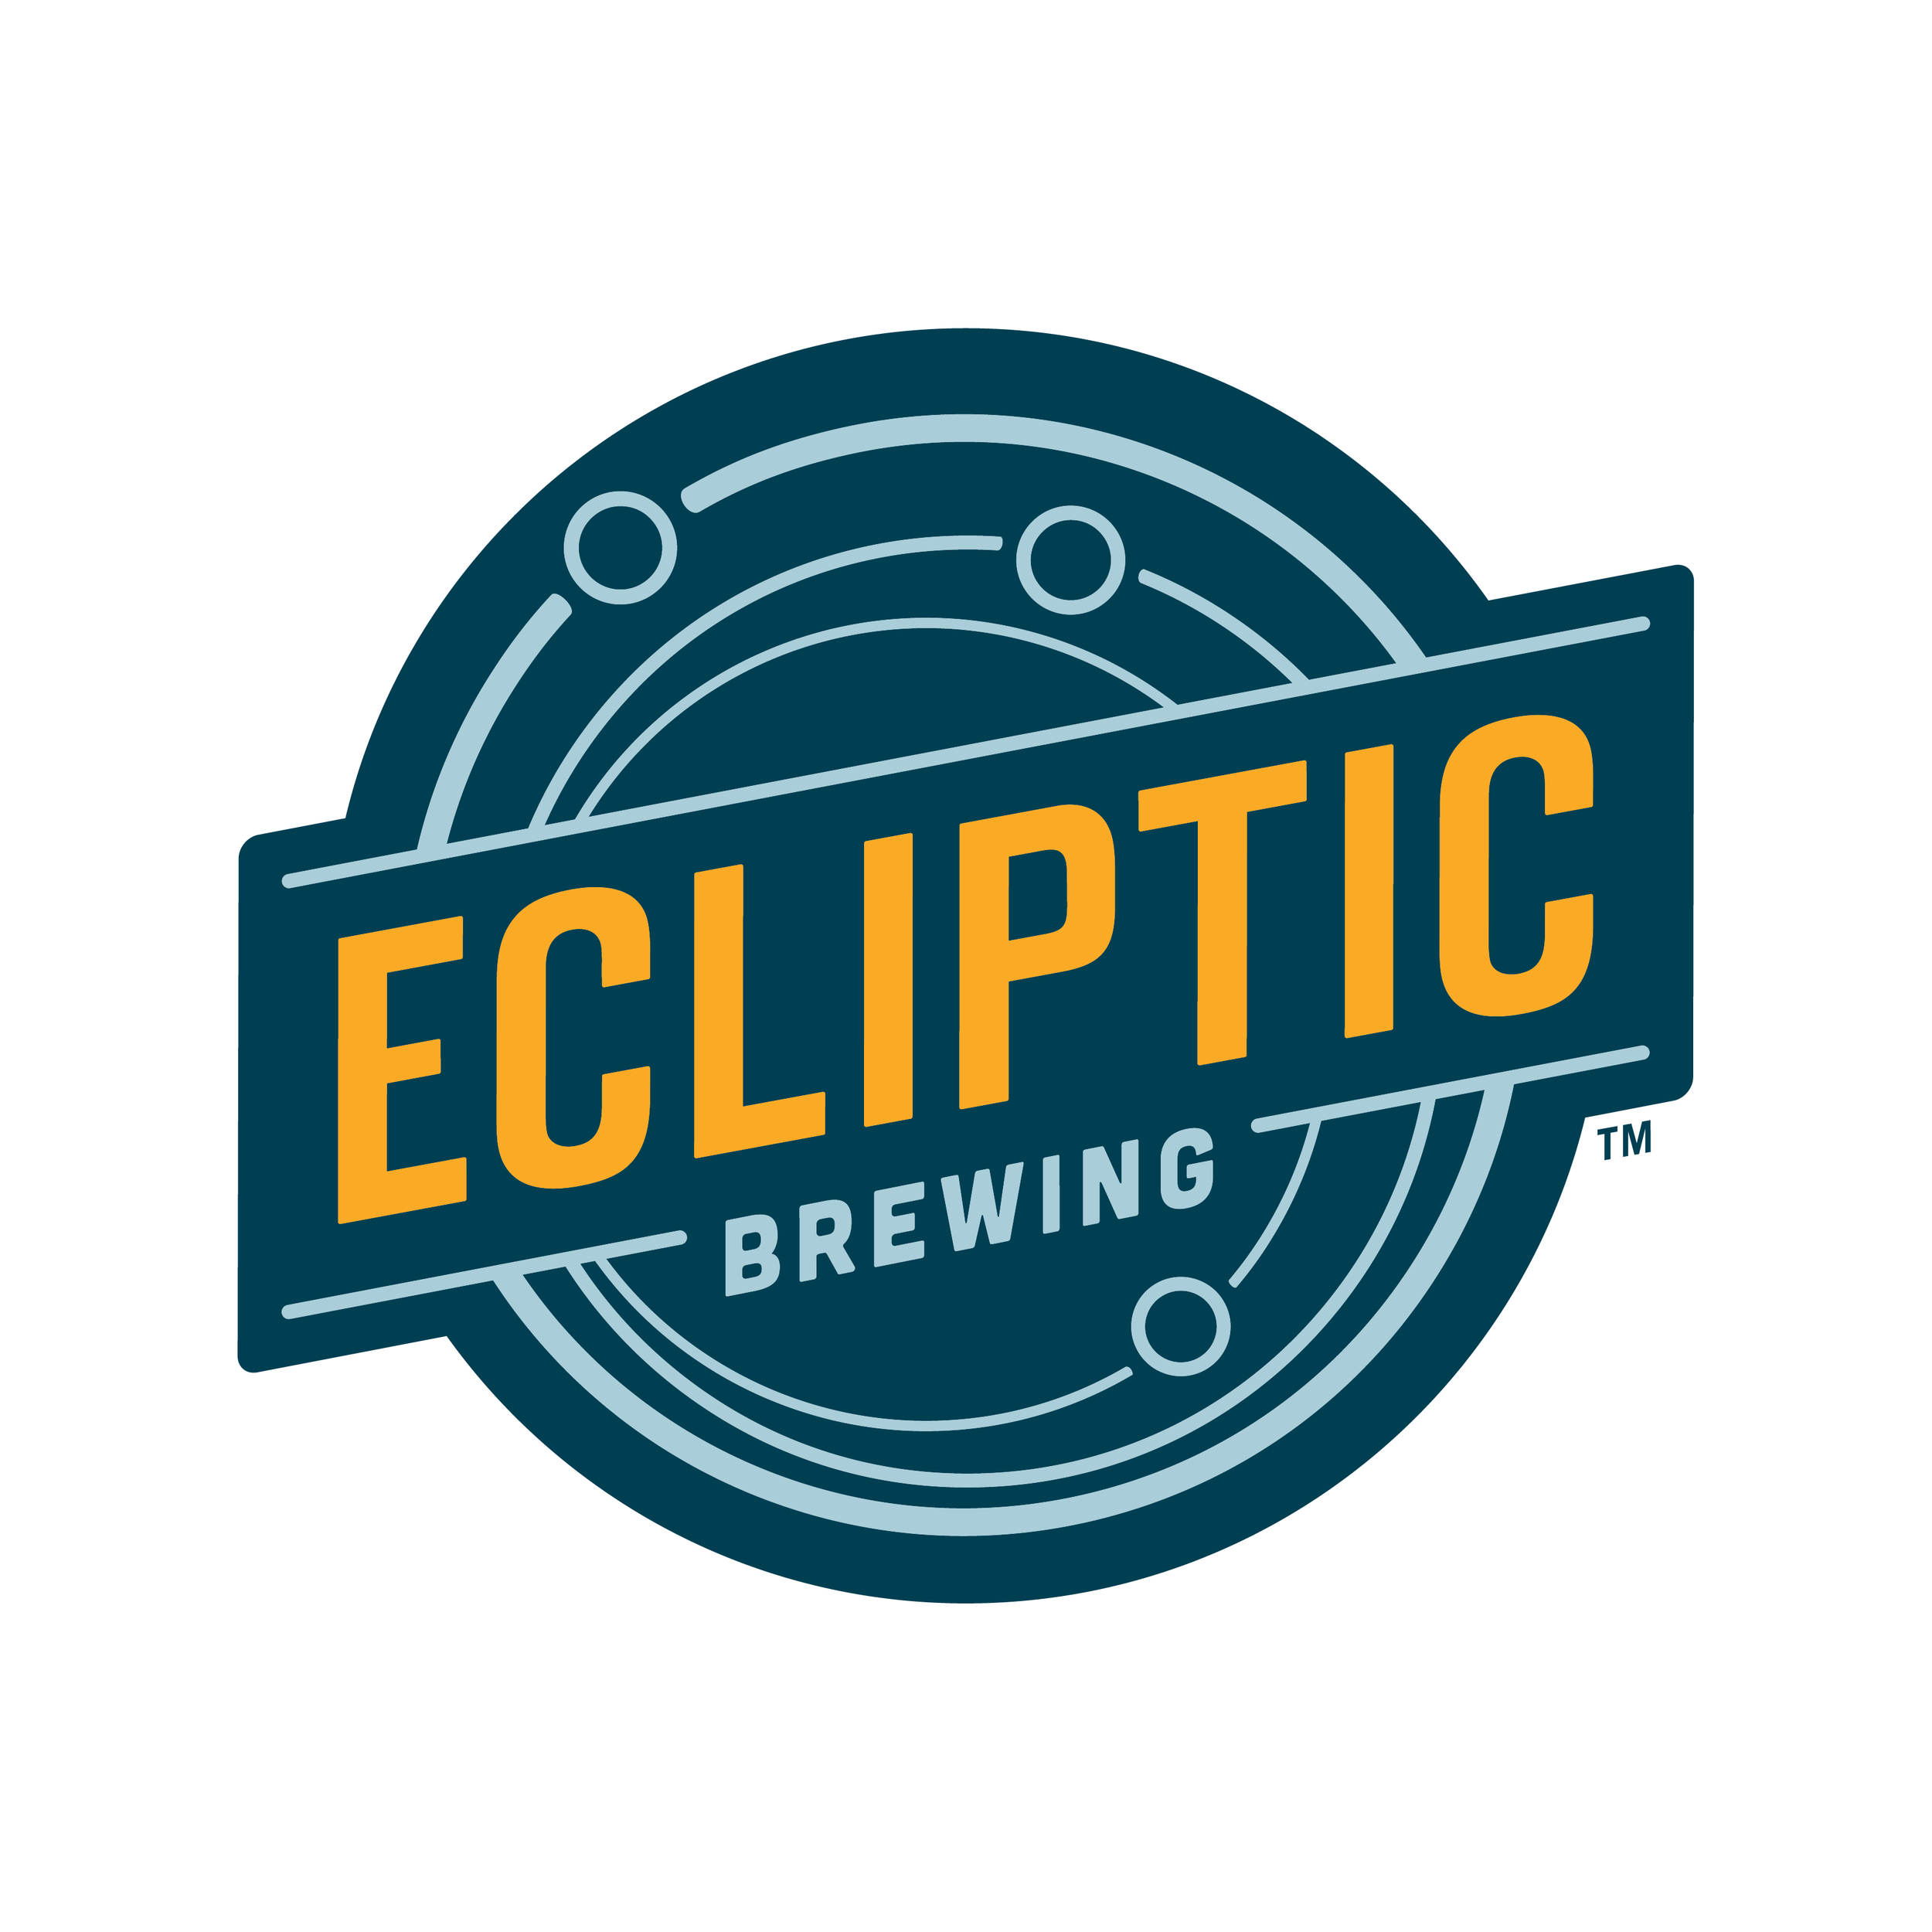 Ecliptic-01.png